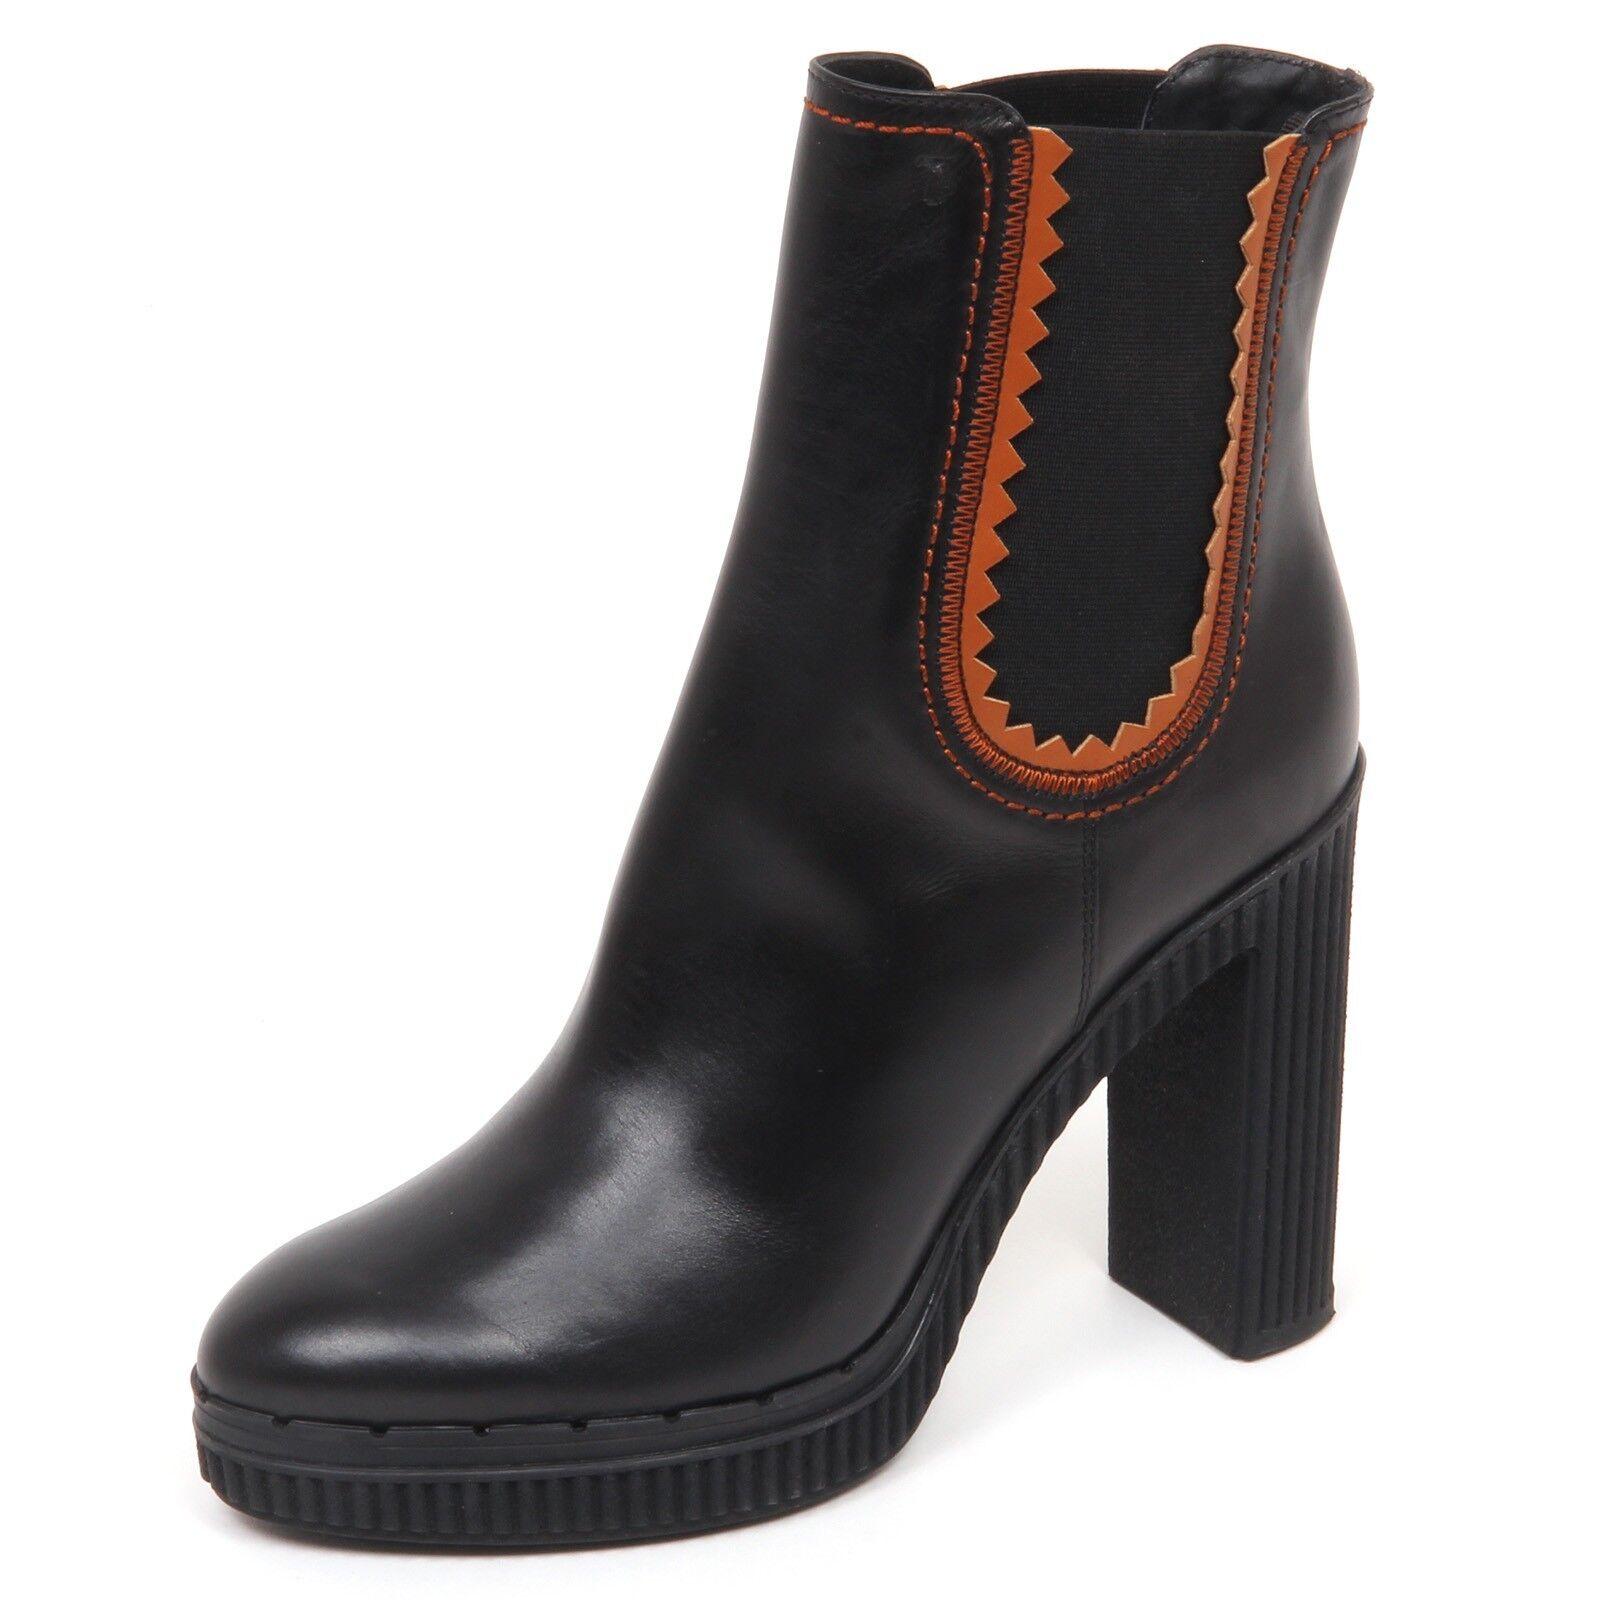 E2926 Tronchetto mujer negro Tod'S zapatos Bota Zapato Mujer